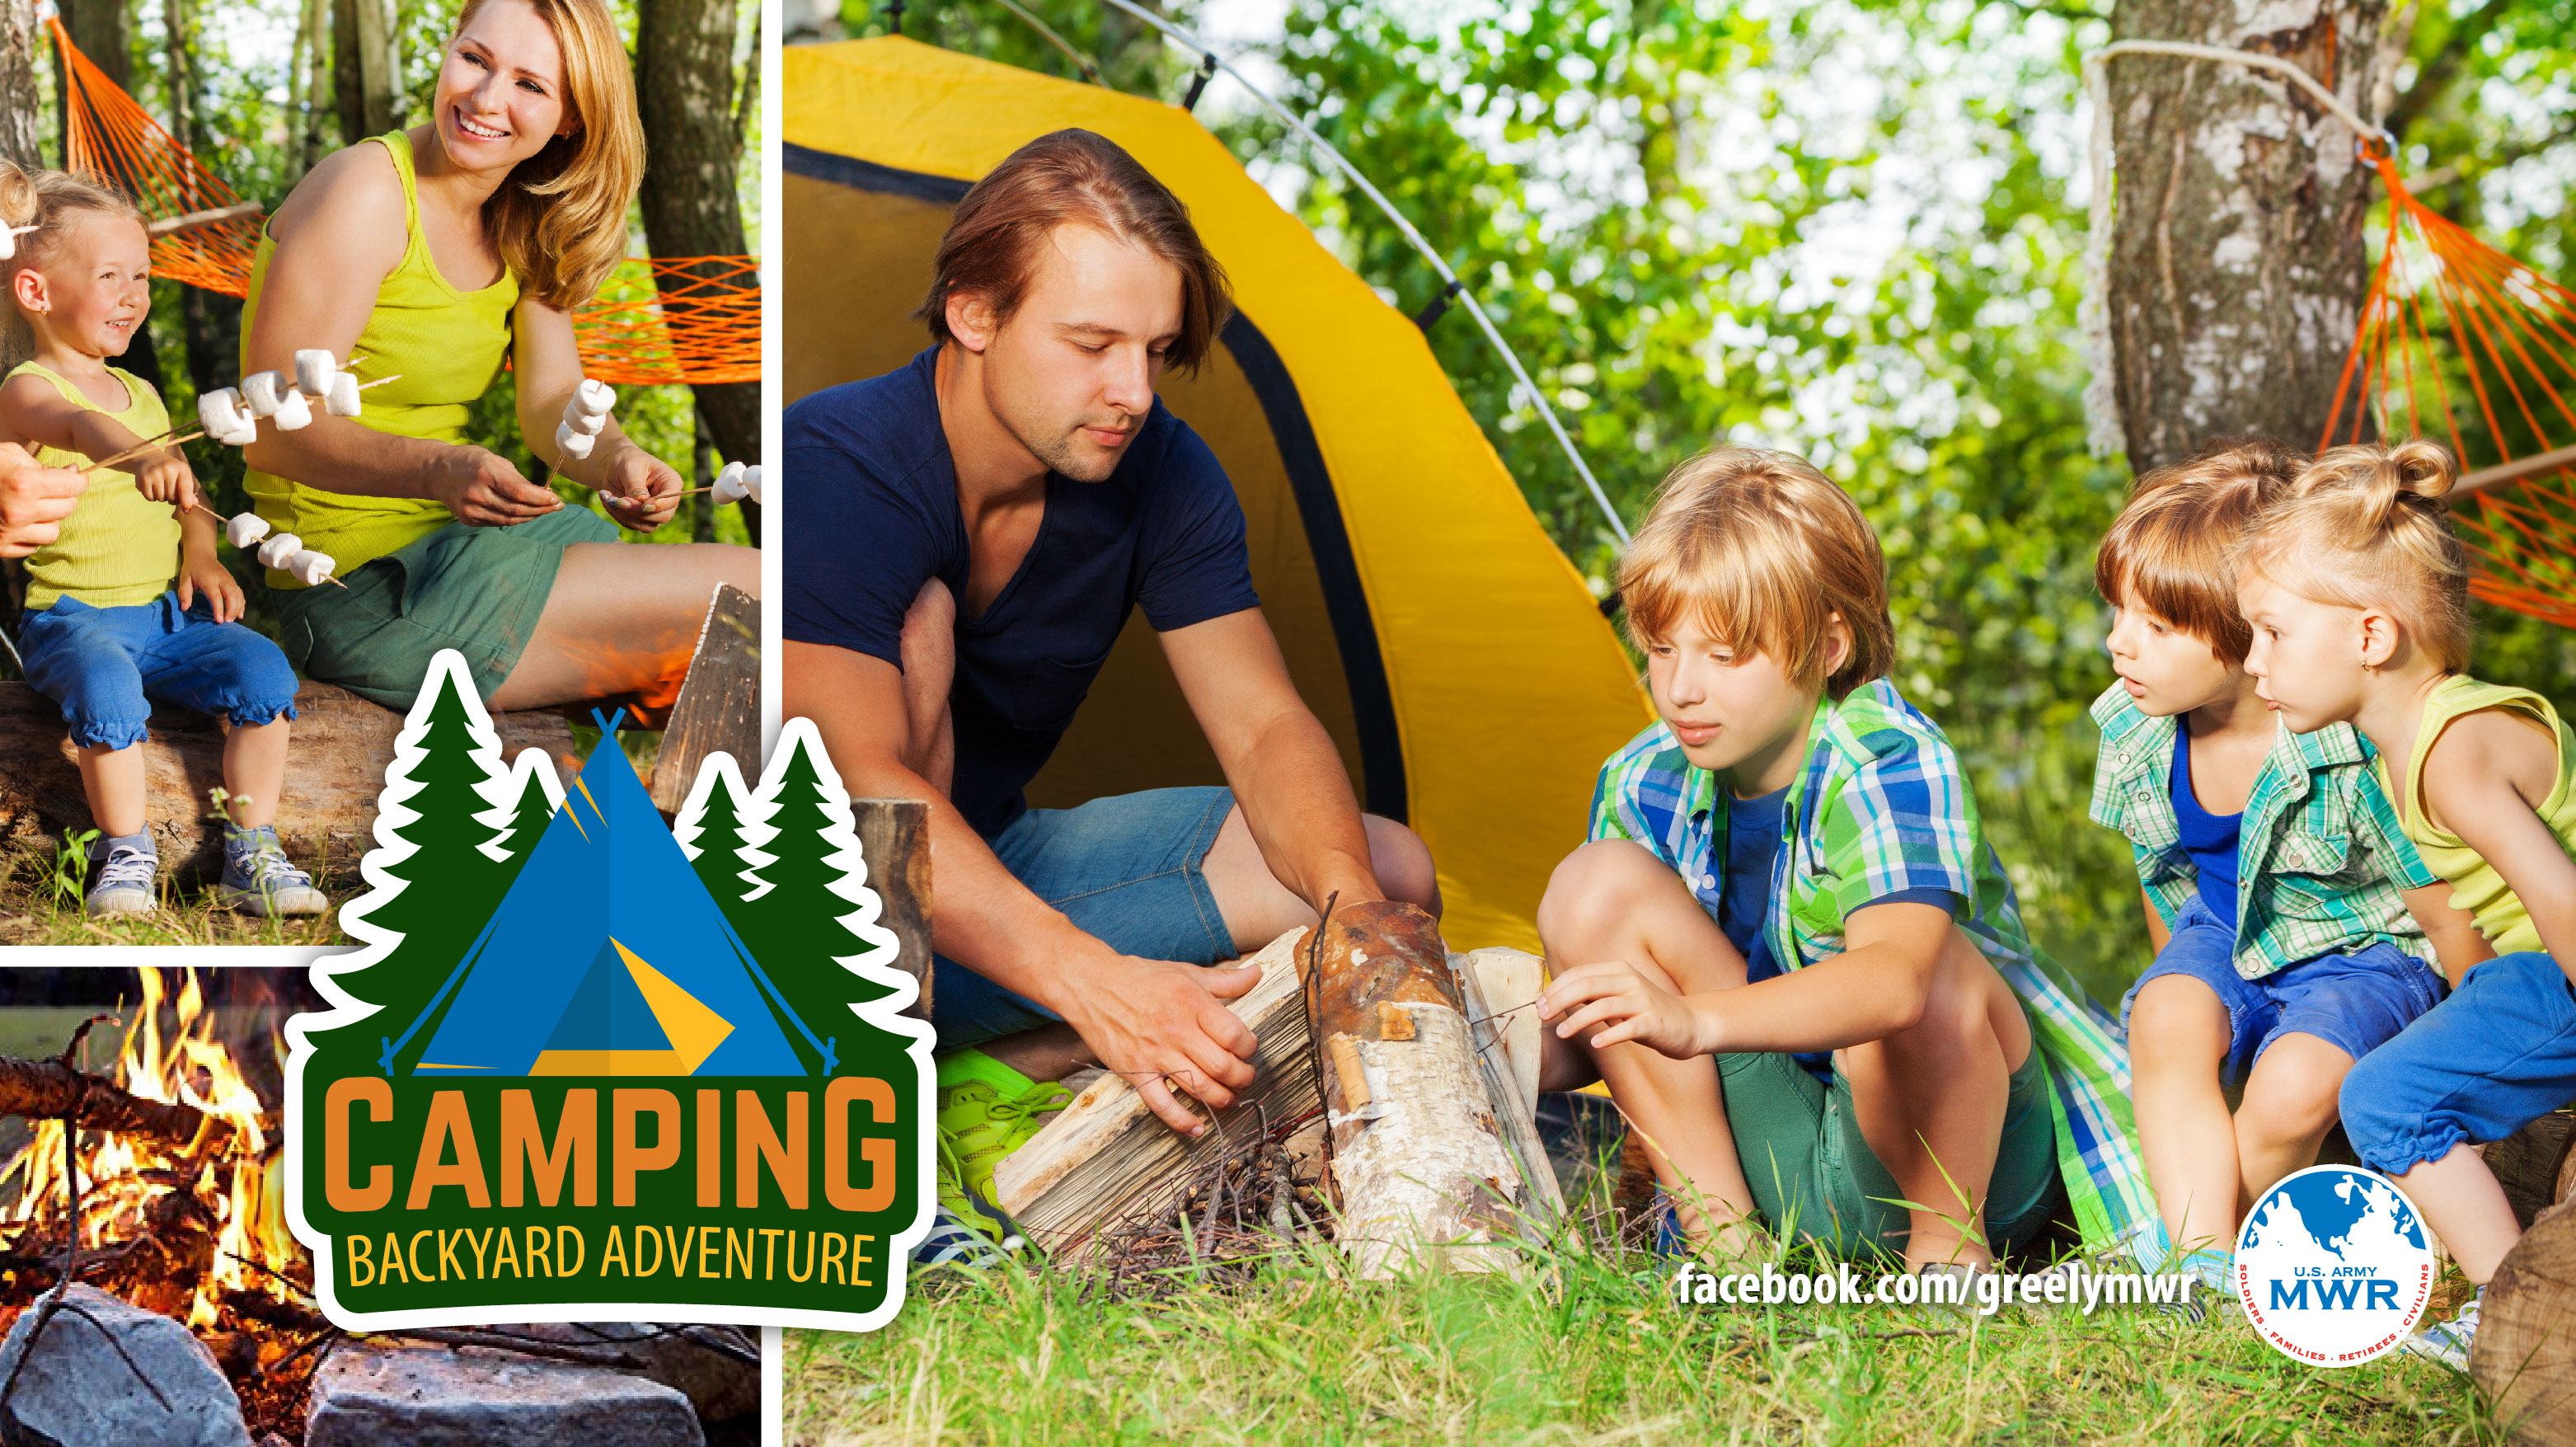 Camping - Backyard Adventure